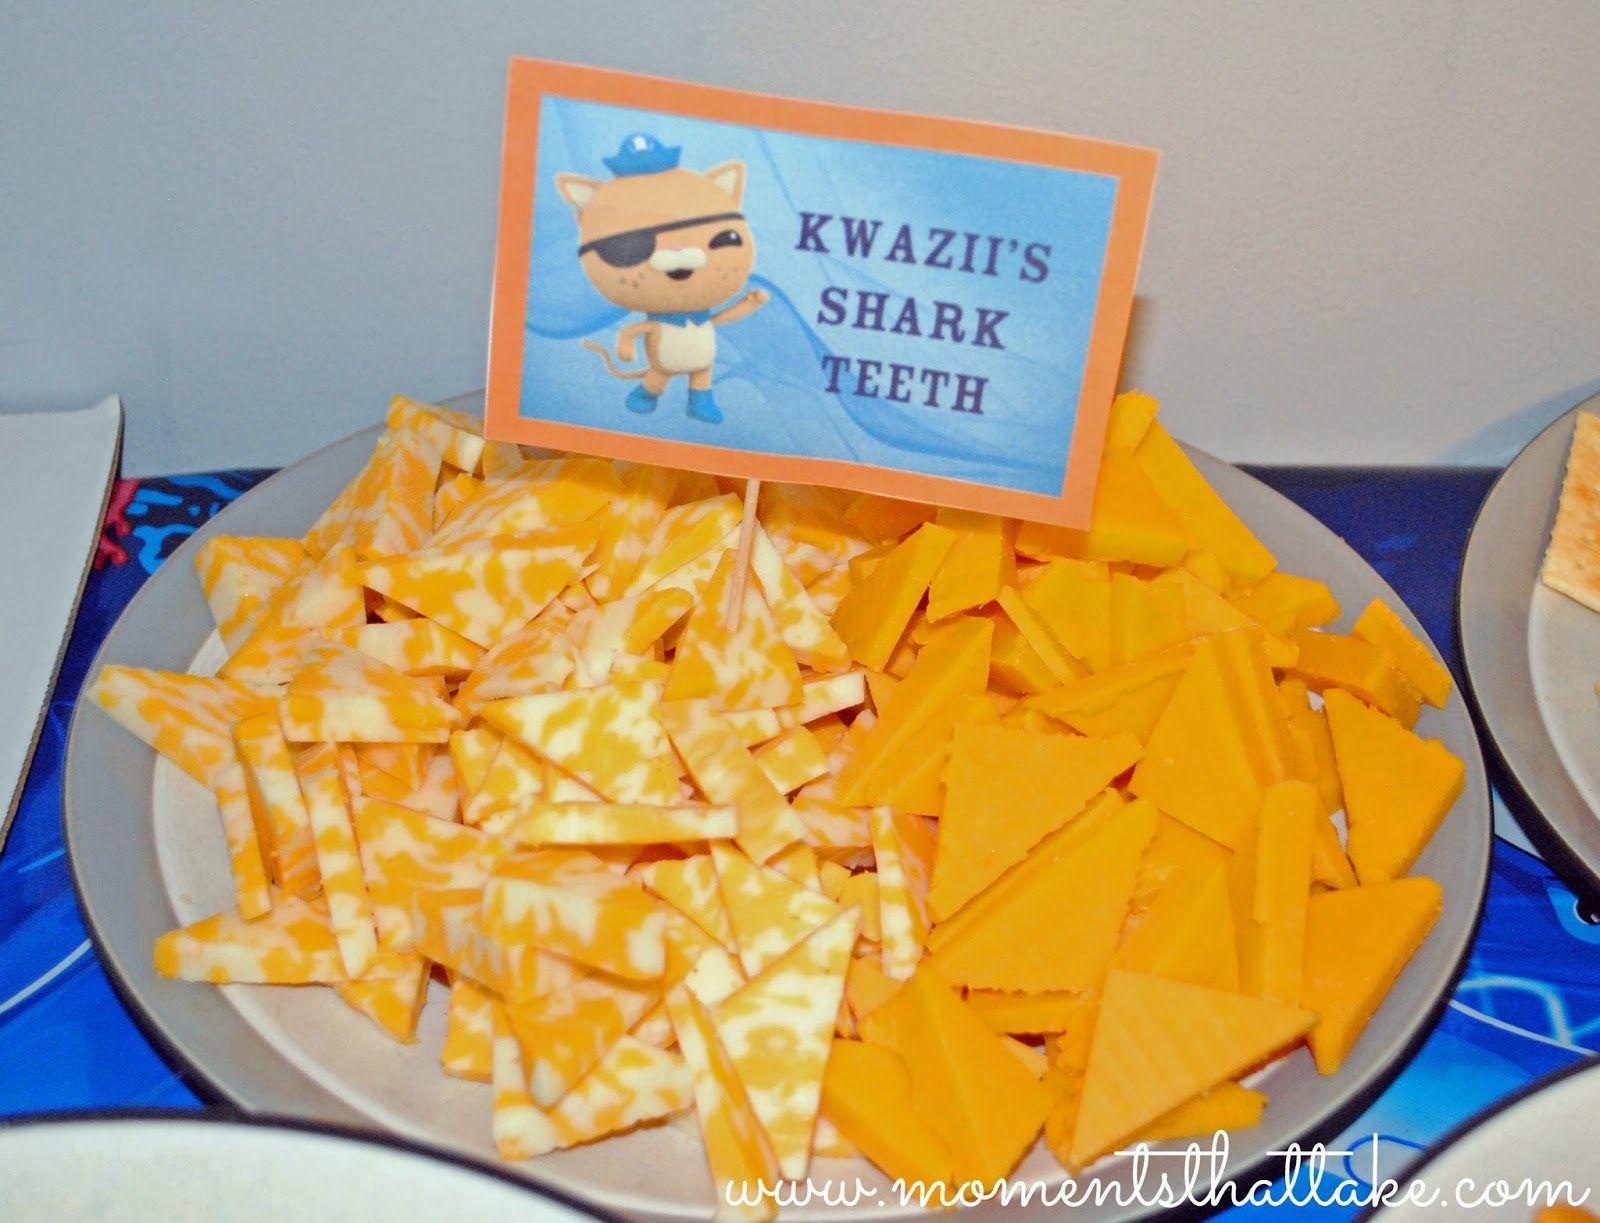 Octonauts Birthday Party Food Ideas Kwaziis Shark Teeth